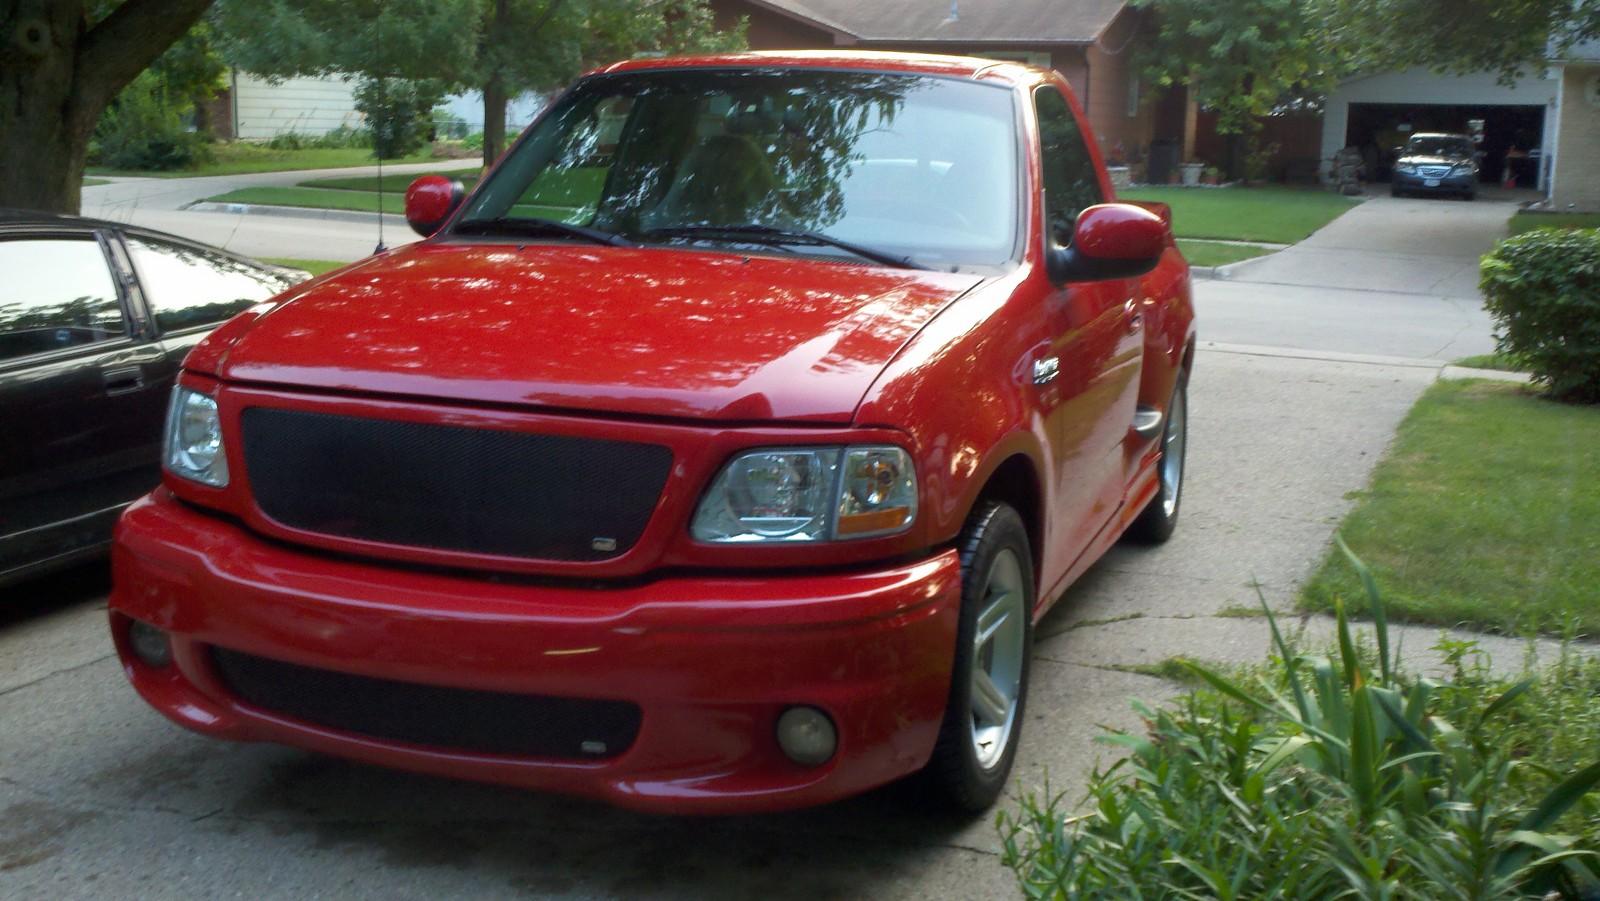 Ford Extended Warranty >> 2003 Ford F150 Lightning 1/4 mile Drag Racing timeslip specs 0-60 - DragTimes.com